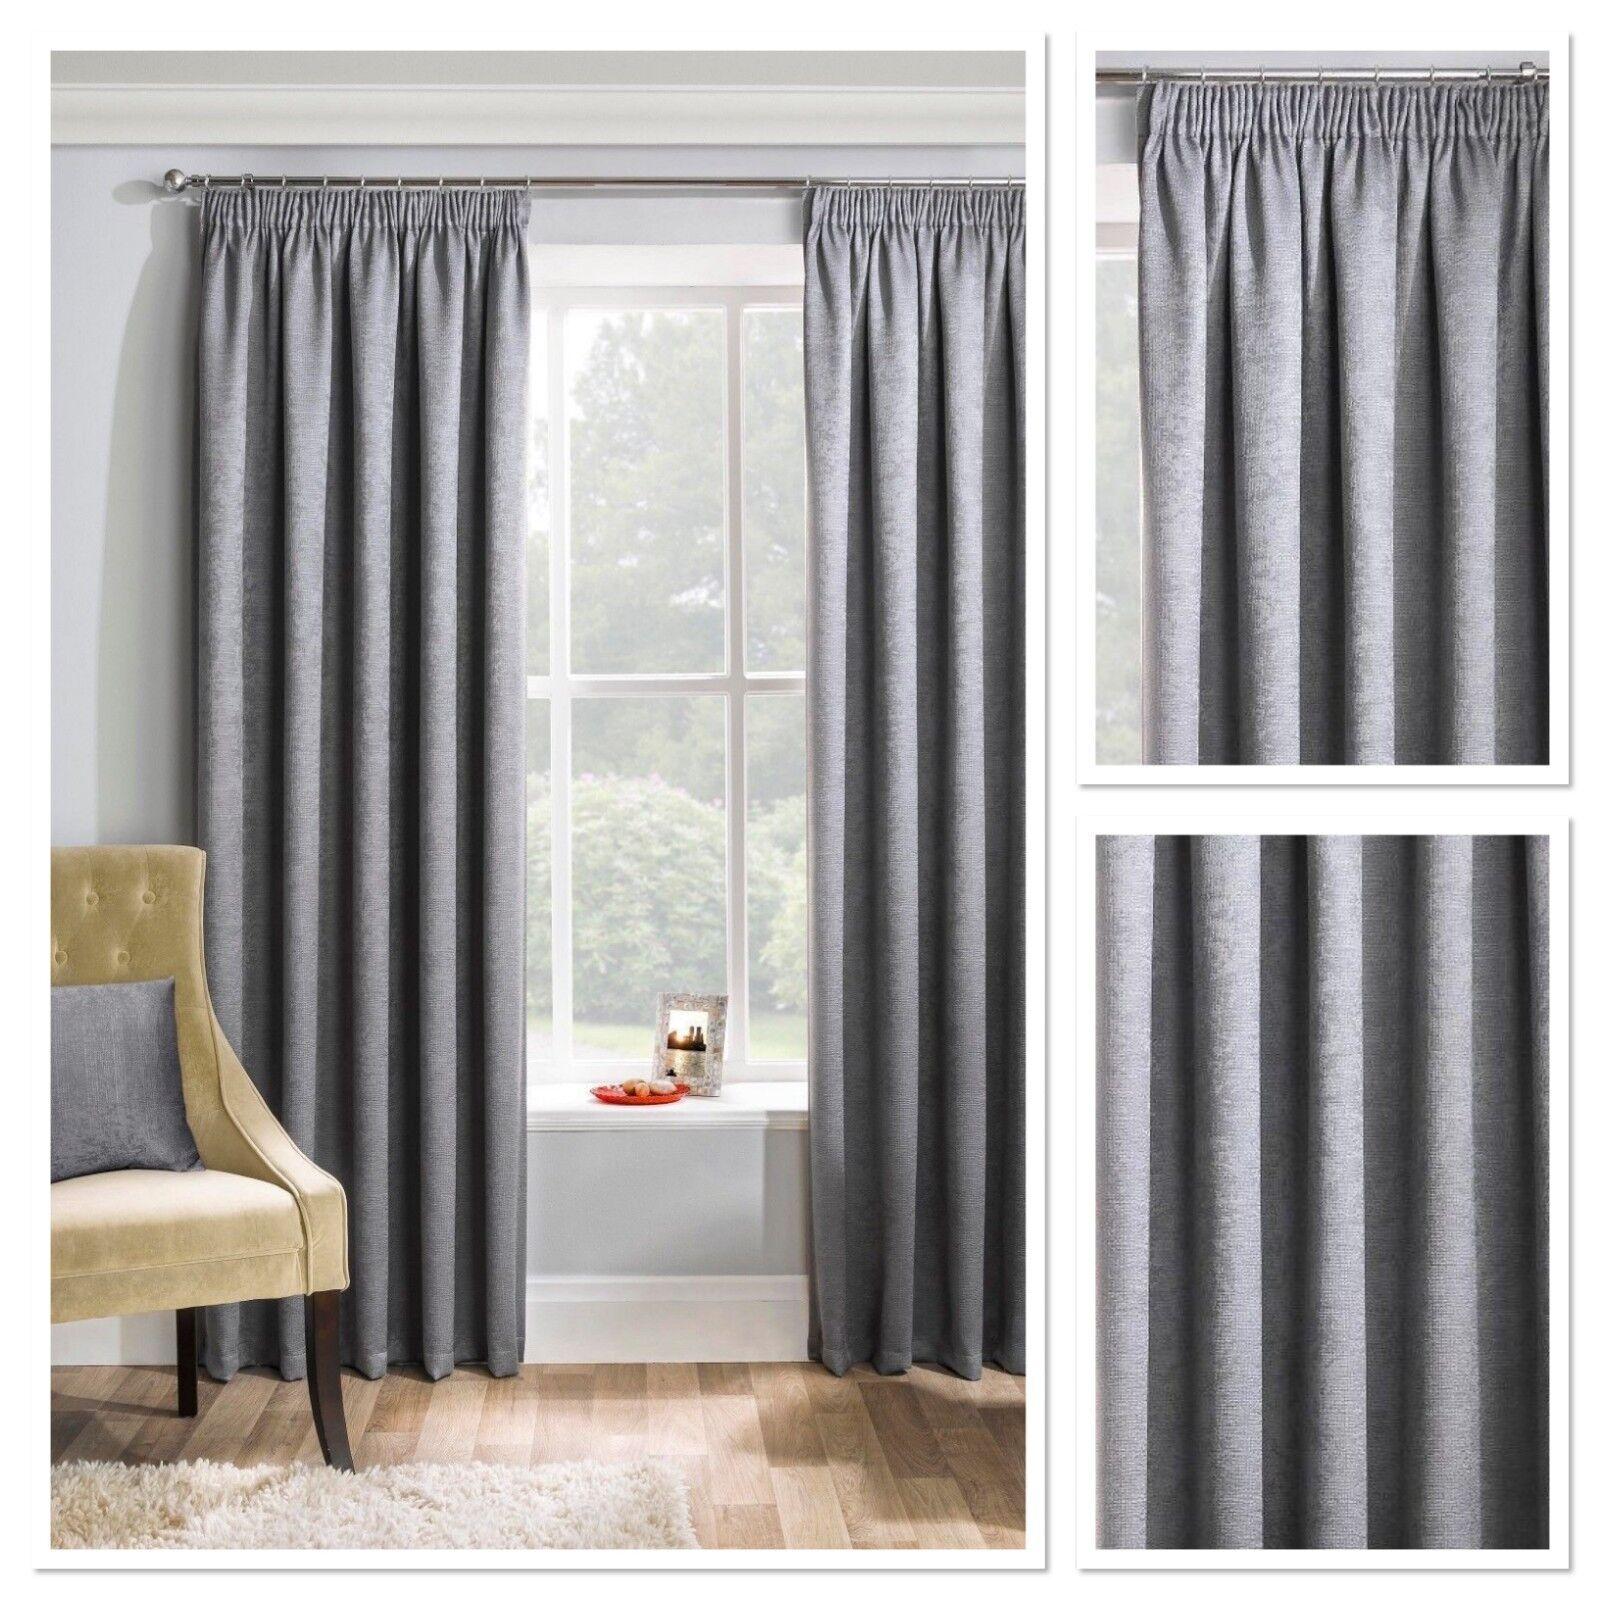 Matriz tejido con textura Blockout termal Totalmente Forrado Cortinas PLISADAS DE LÁPICES gris